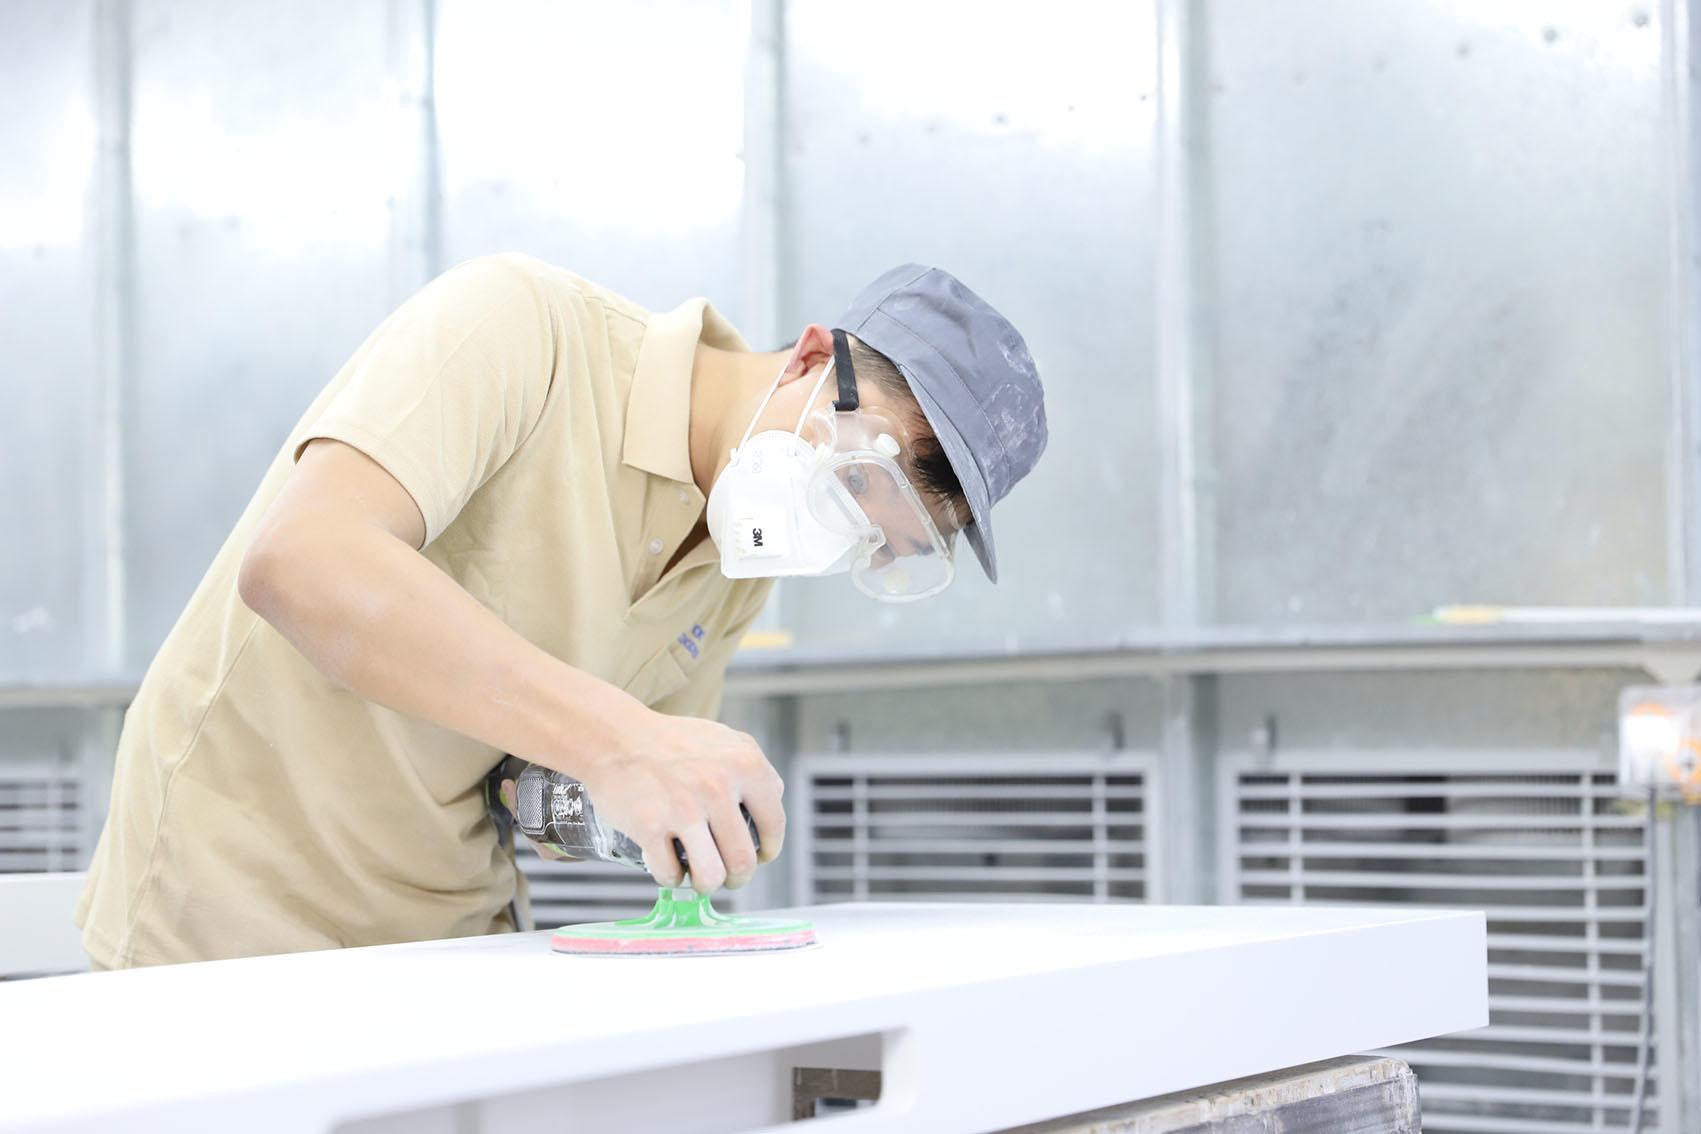 Wash basin production line